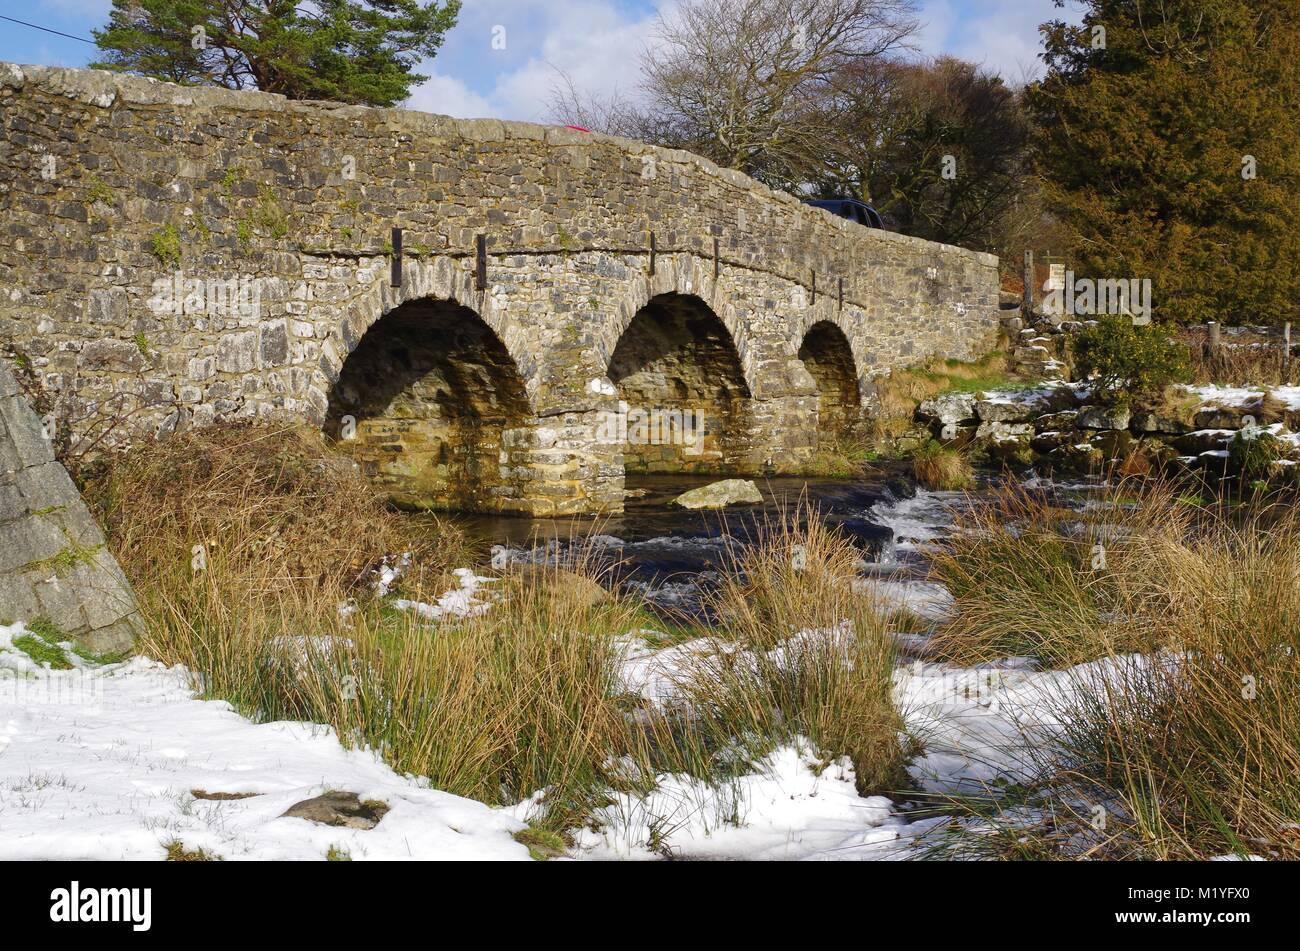 18th Century Granite Bridge over the East Dart River at Postbridge, Dartmoor National Park, Devon, UK. February, - Stock Image